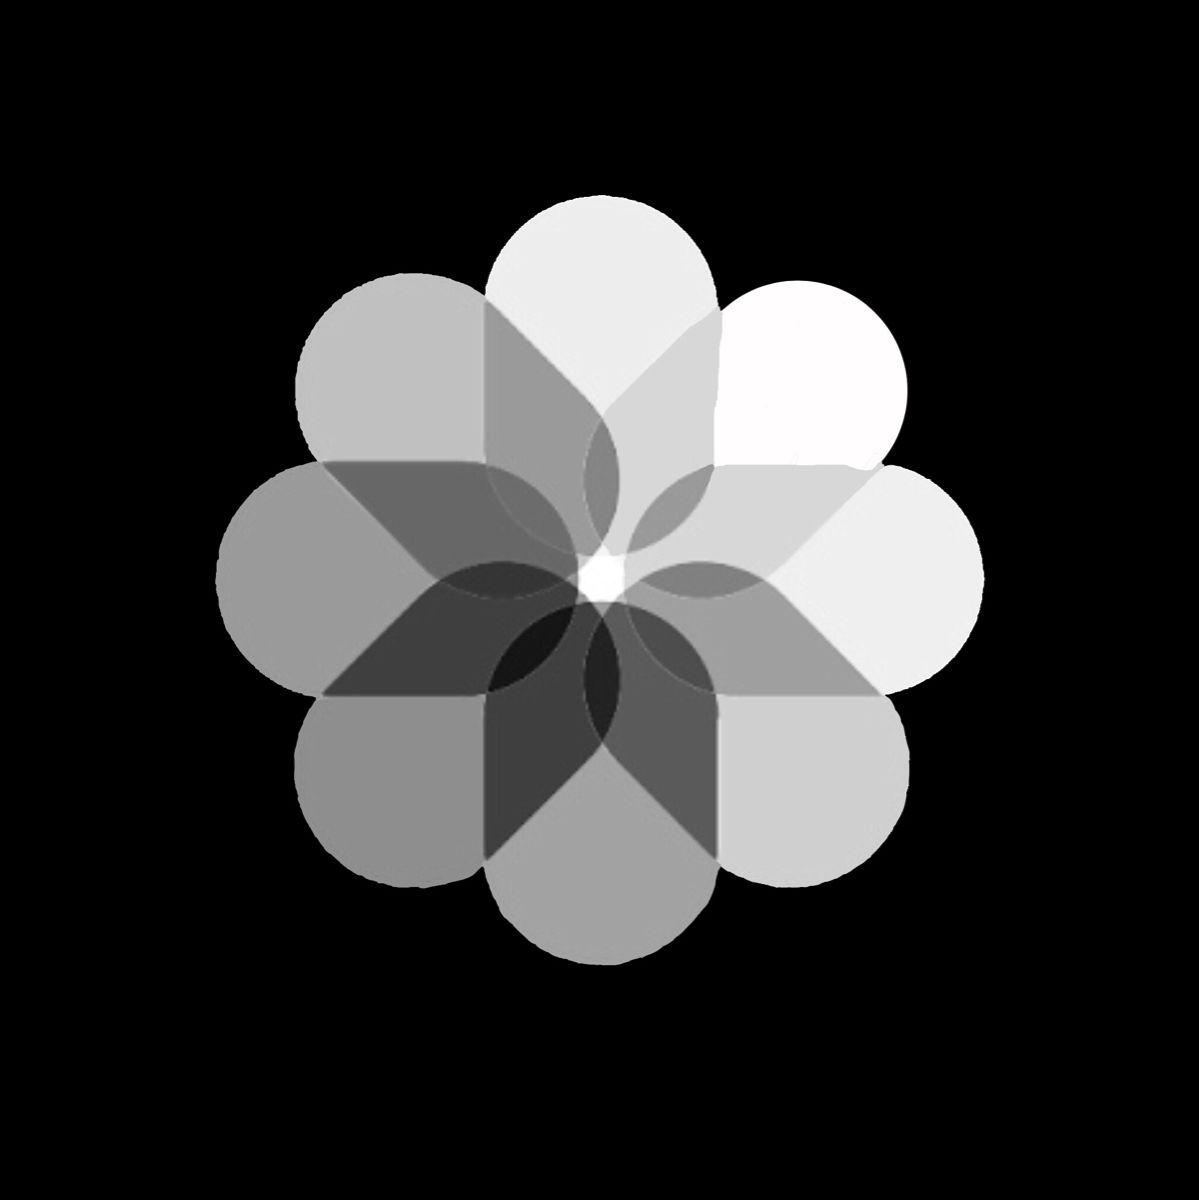 Black Photos Logo Wallpaper Iphone Neon Iphone Photo App Iphone Wallpaper Ios